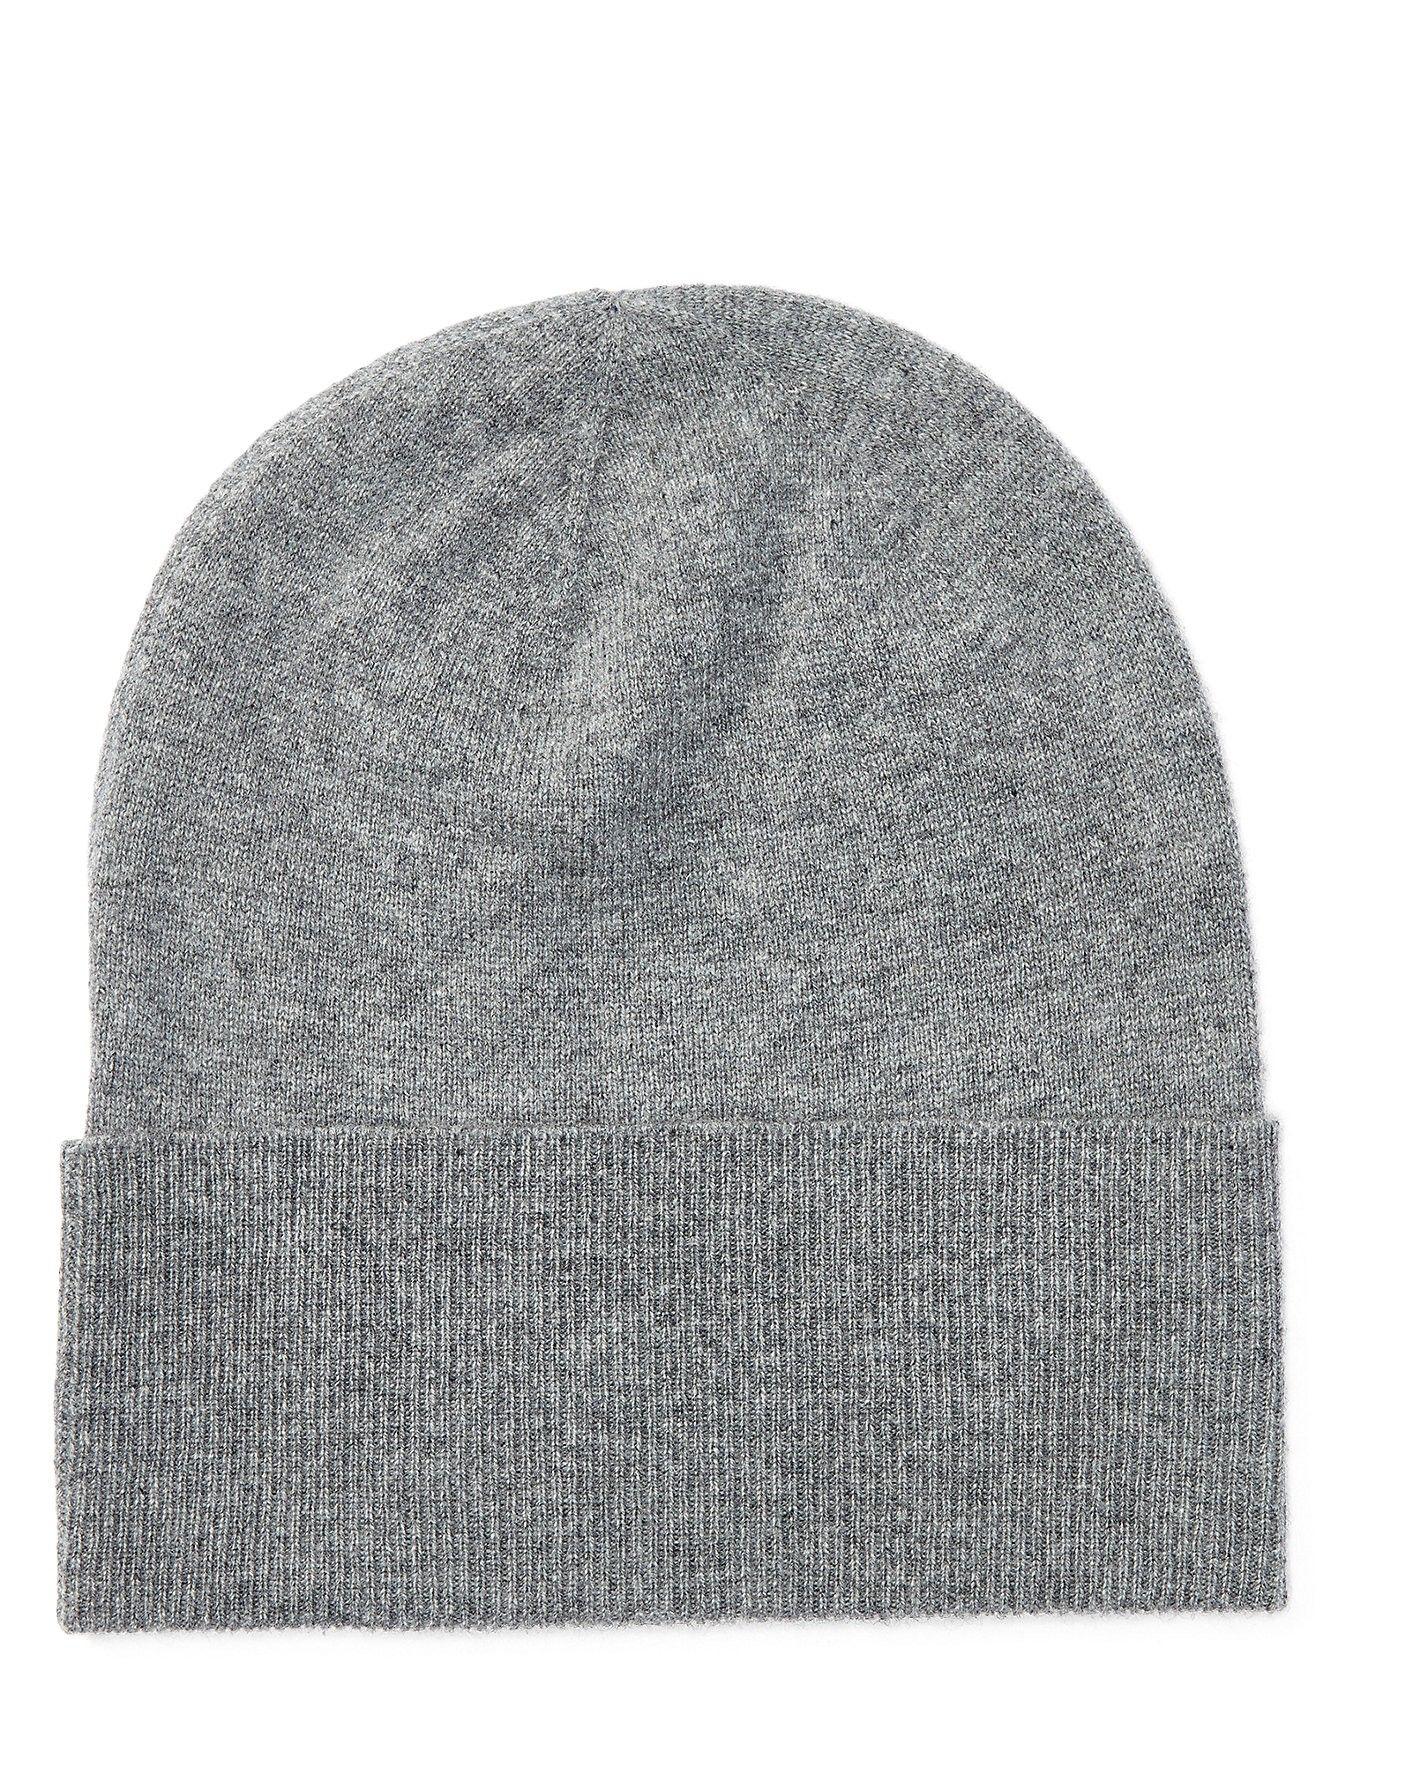 RALPH LAUREN Wool-Cashmere Hat.  ralphlauren  all  29c32992642